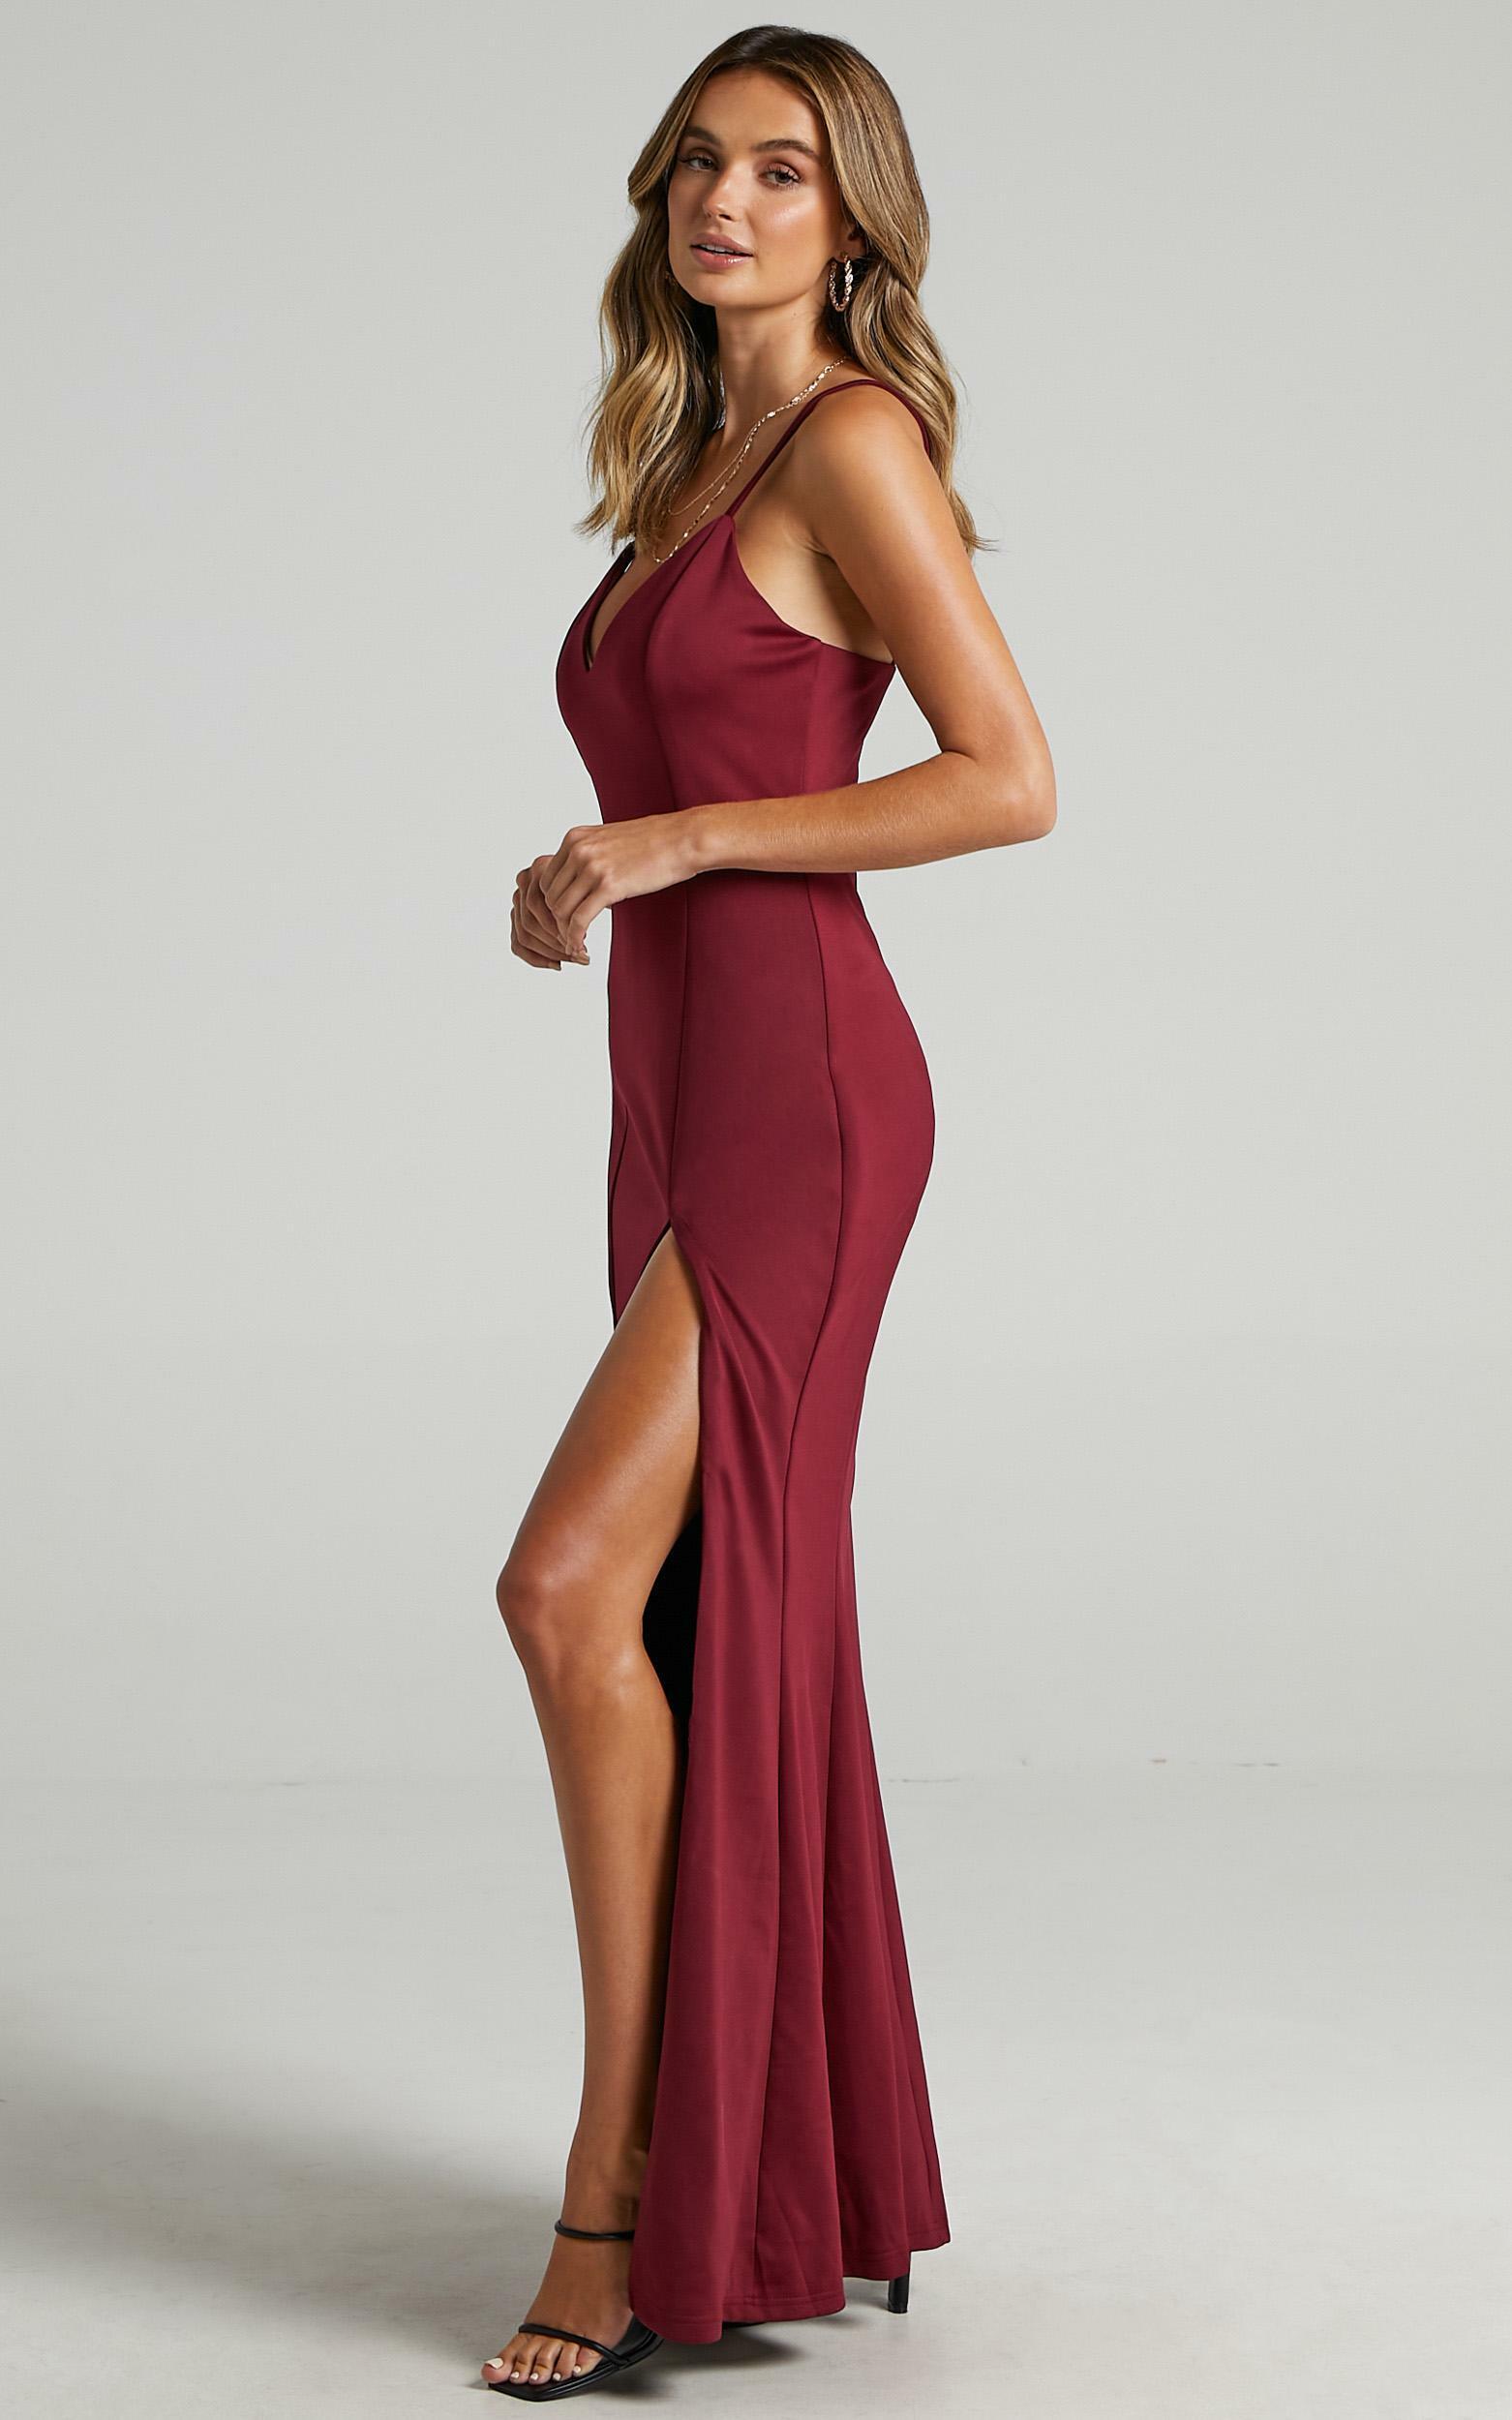 Dare To Dream Maxi Dress in Wine - 20 (XXXXL), Wine, hi-res image number null